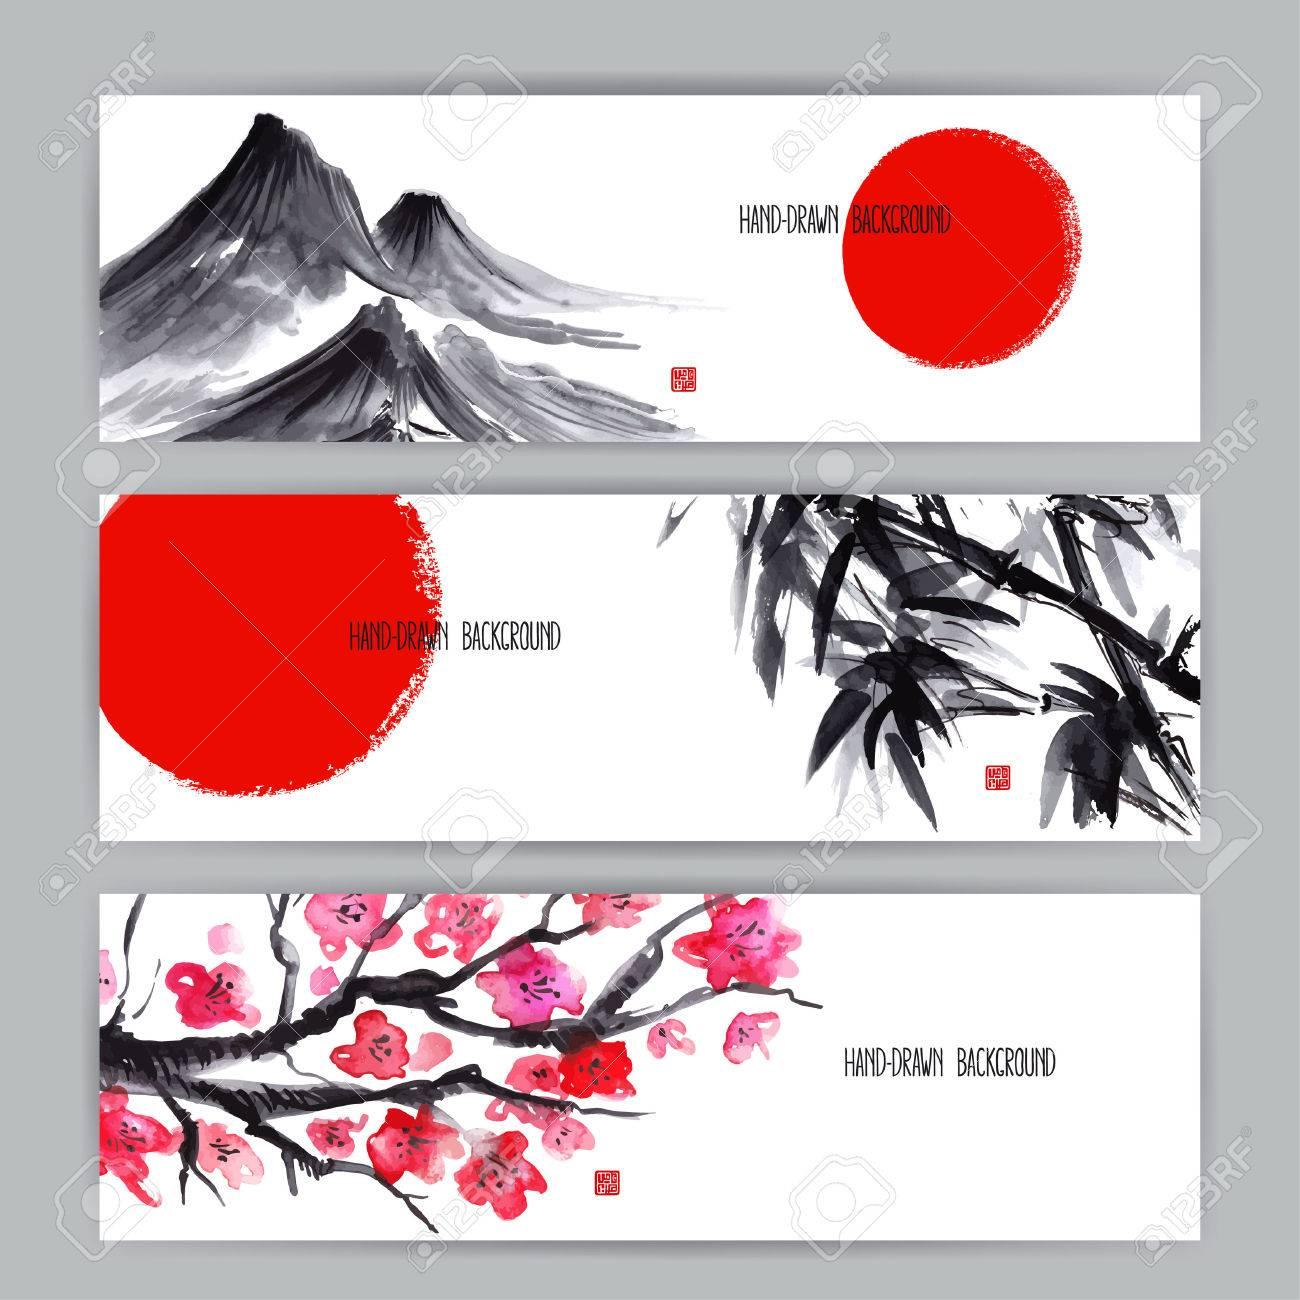 three beautiful banners with Japanese natural motifs. Sumi-e. hand-drawn illustration - 40920162